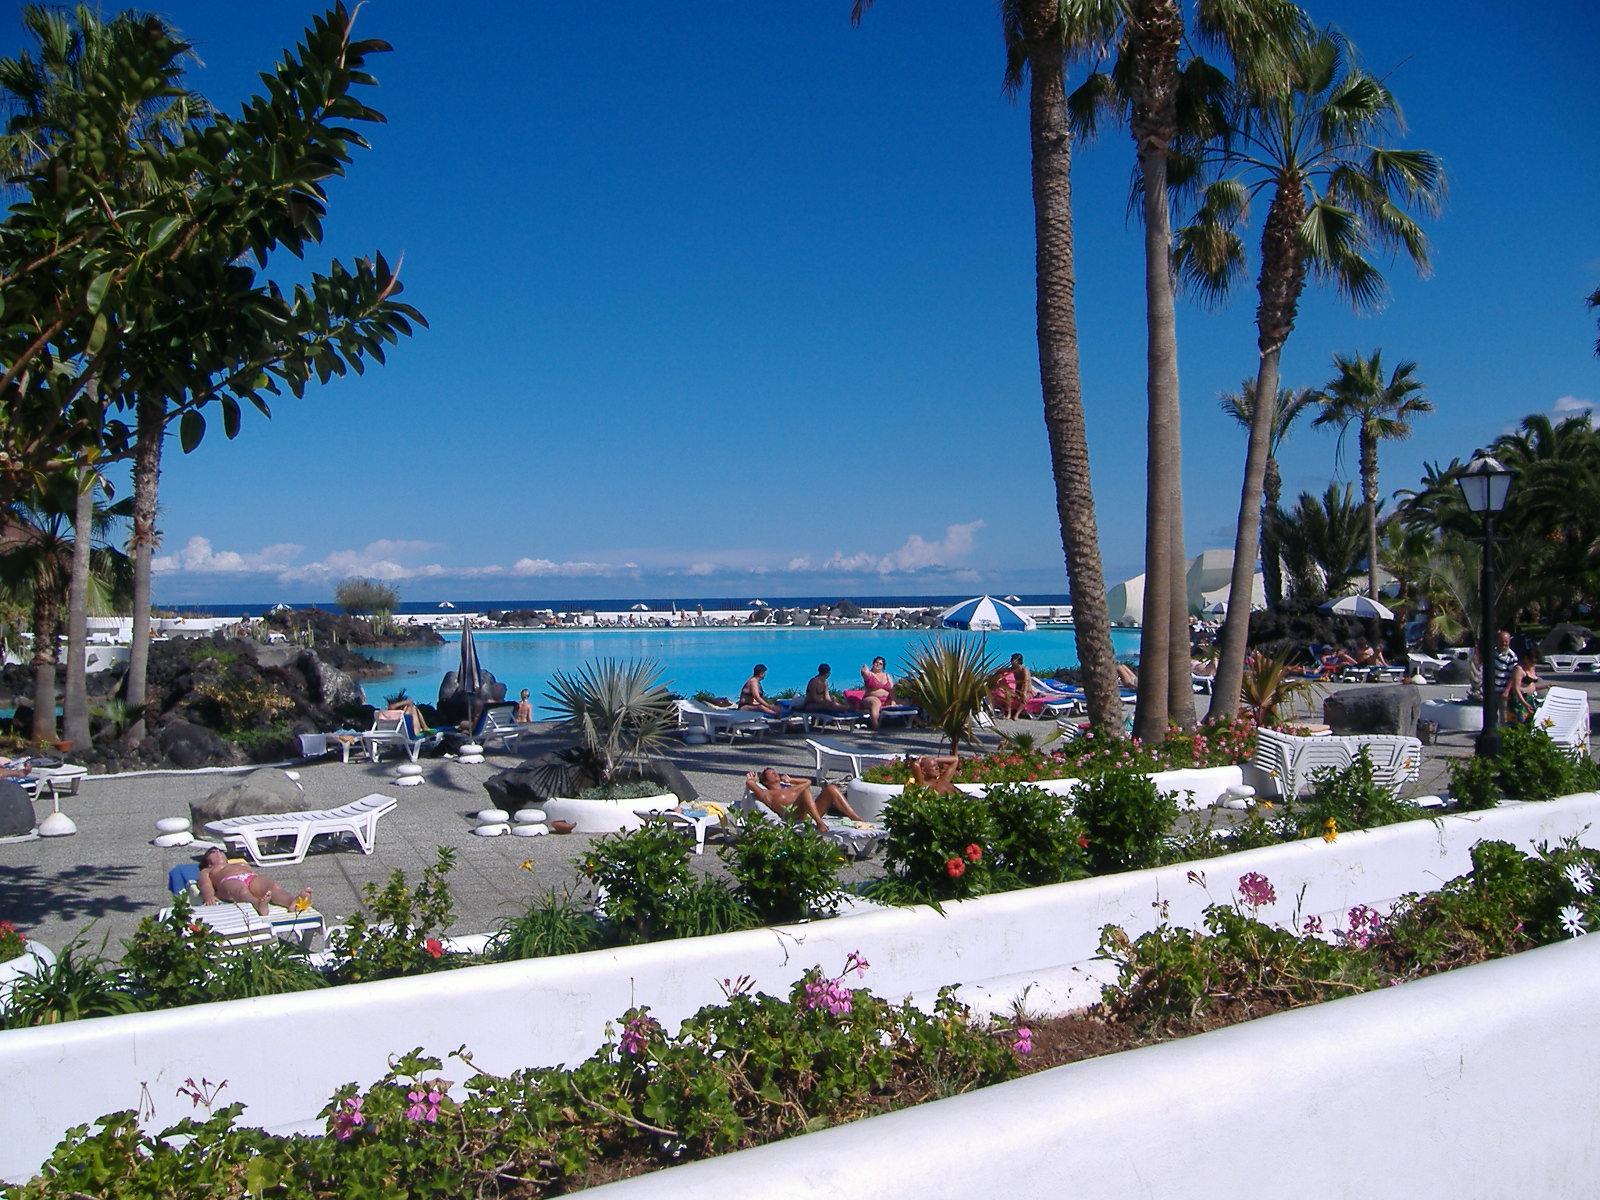 Car Hire Palma Airport >> johnsunseaandskytravel: Playa de las Americas - Tenerife Travel Guide